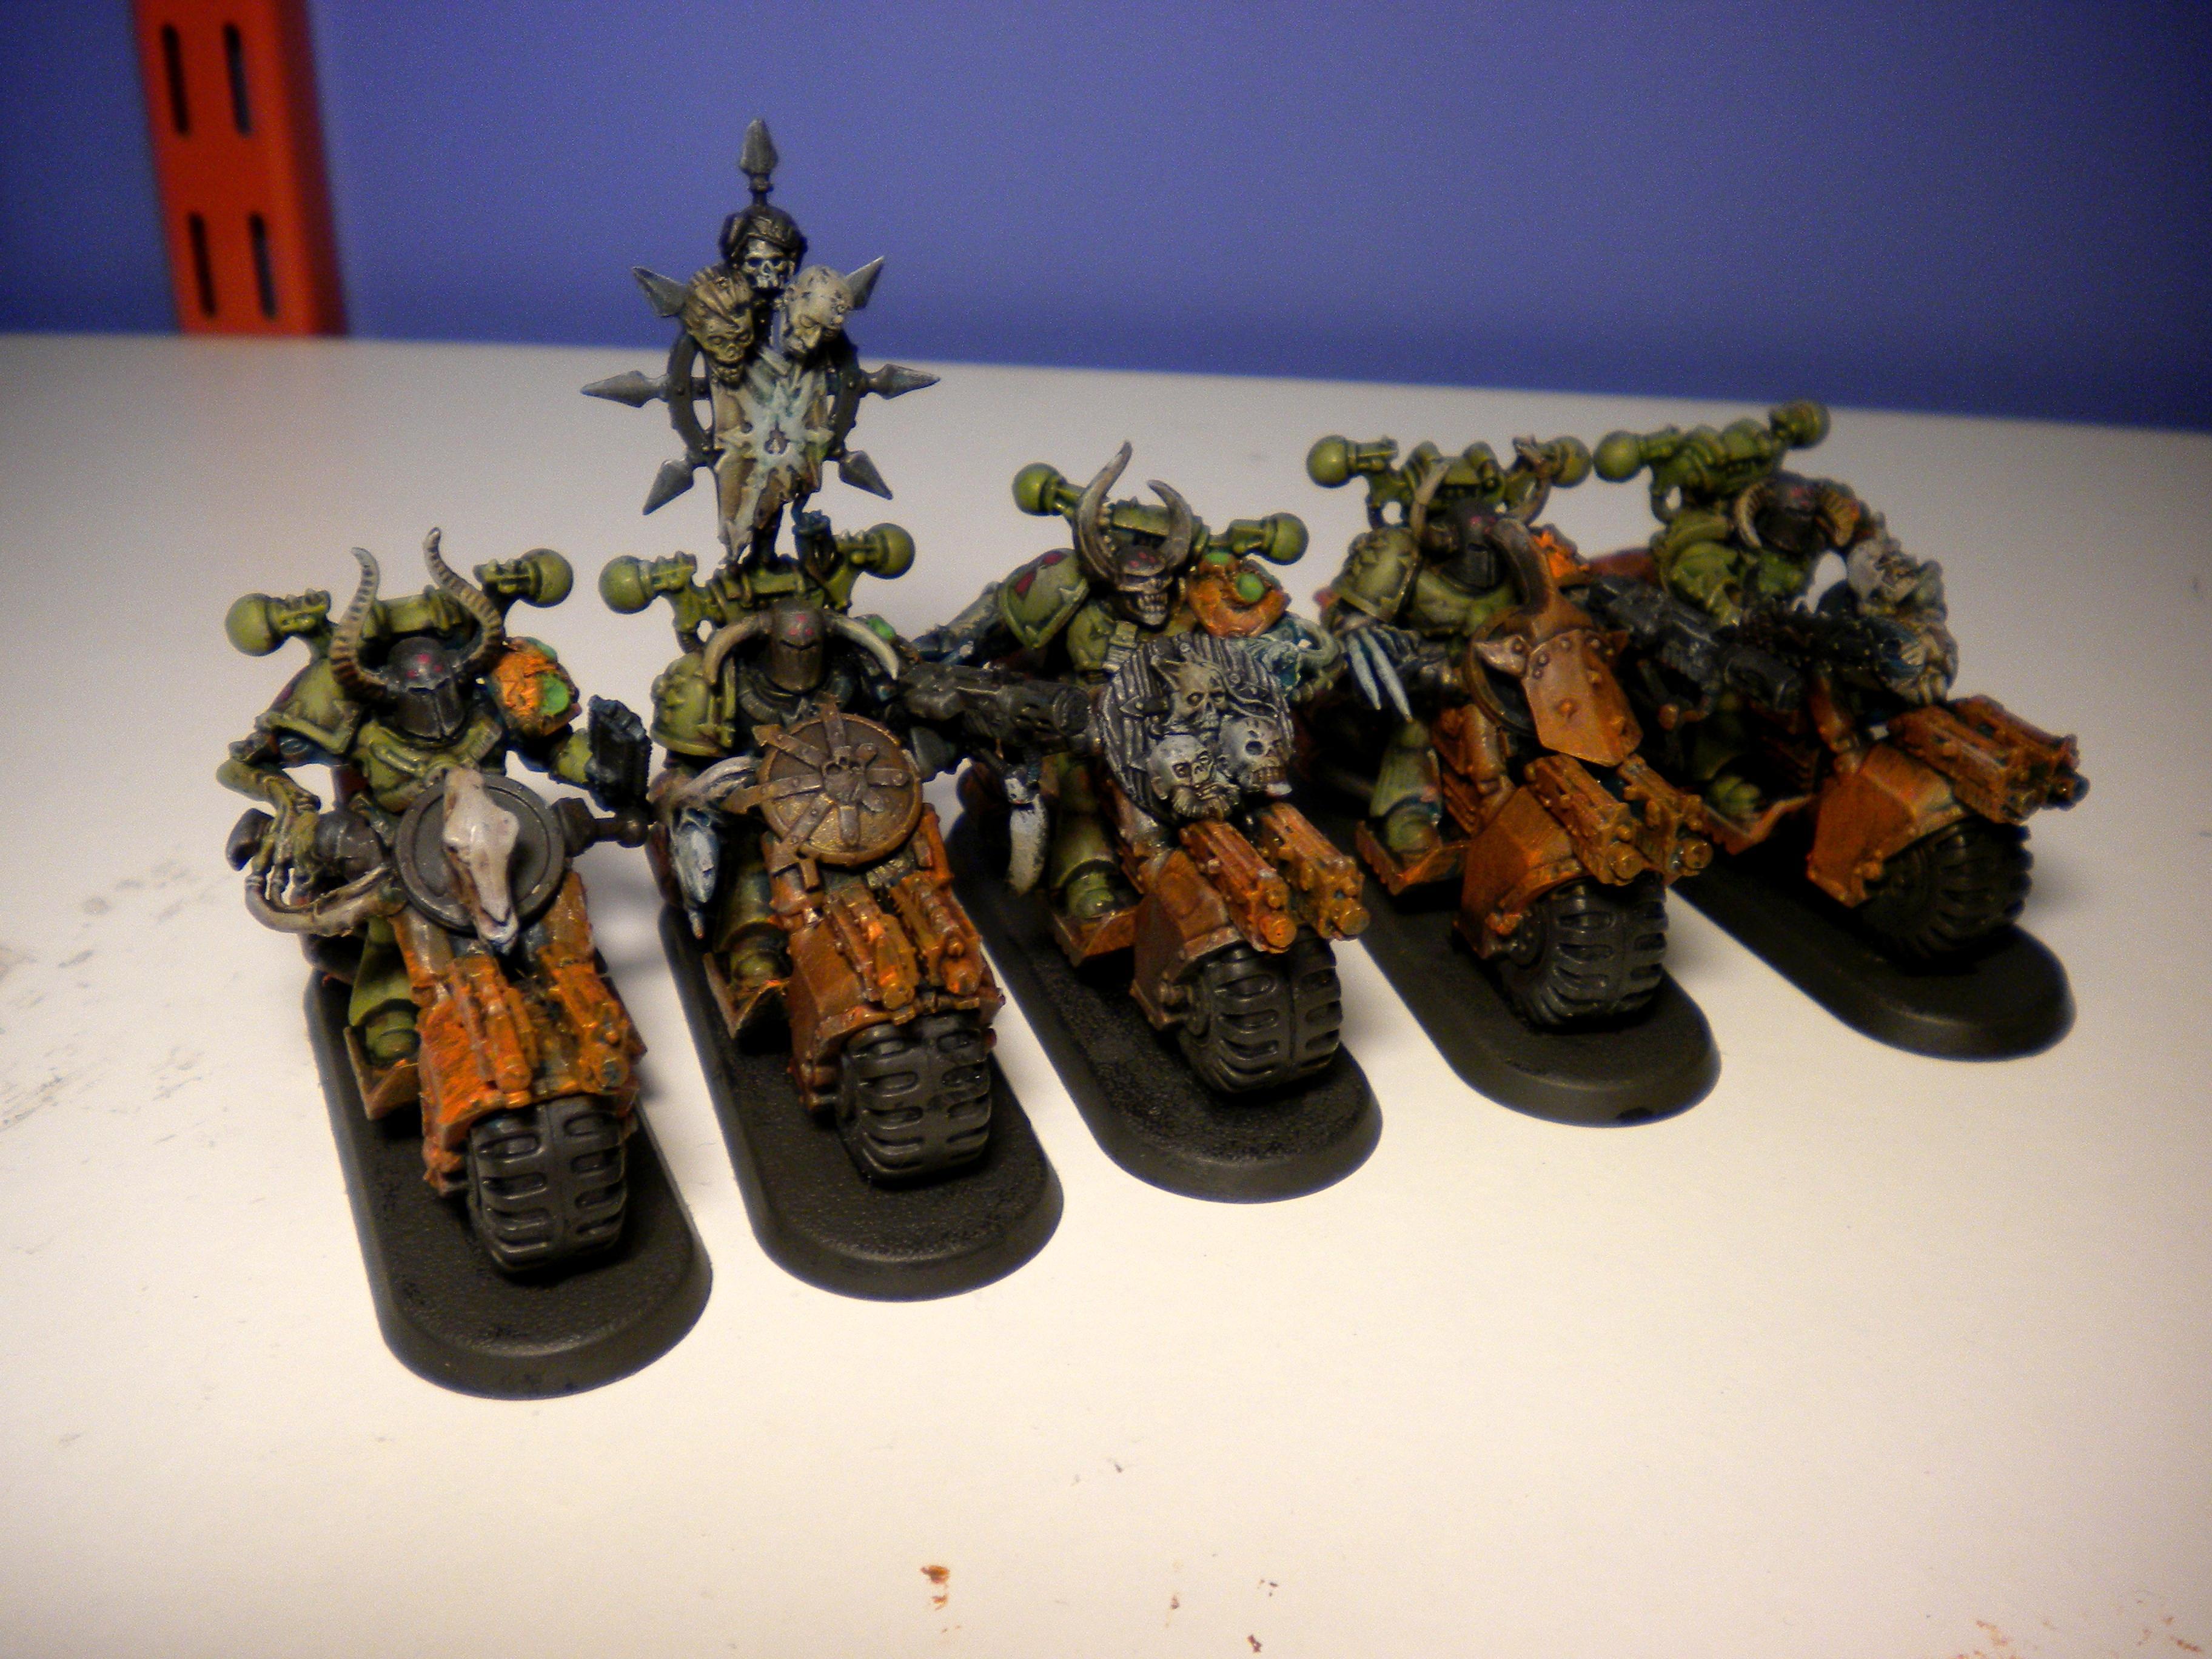 Chaos, Chaos Army, Chaos Rhino, Conversion, Daemon Prince, Defiler, Nurgle, Nurgle Army, Plague Marines